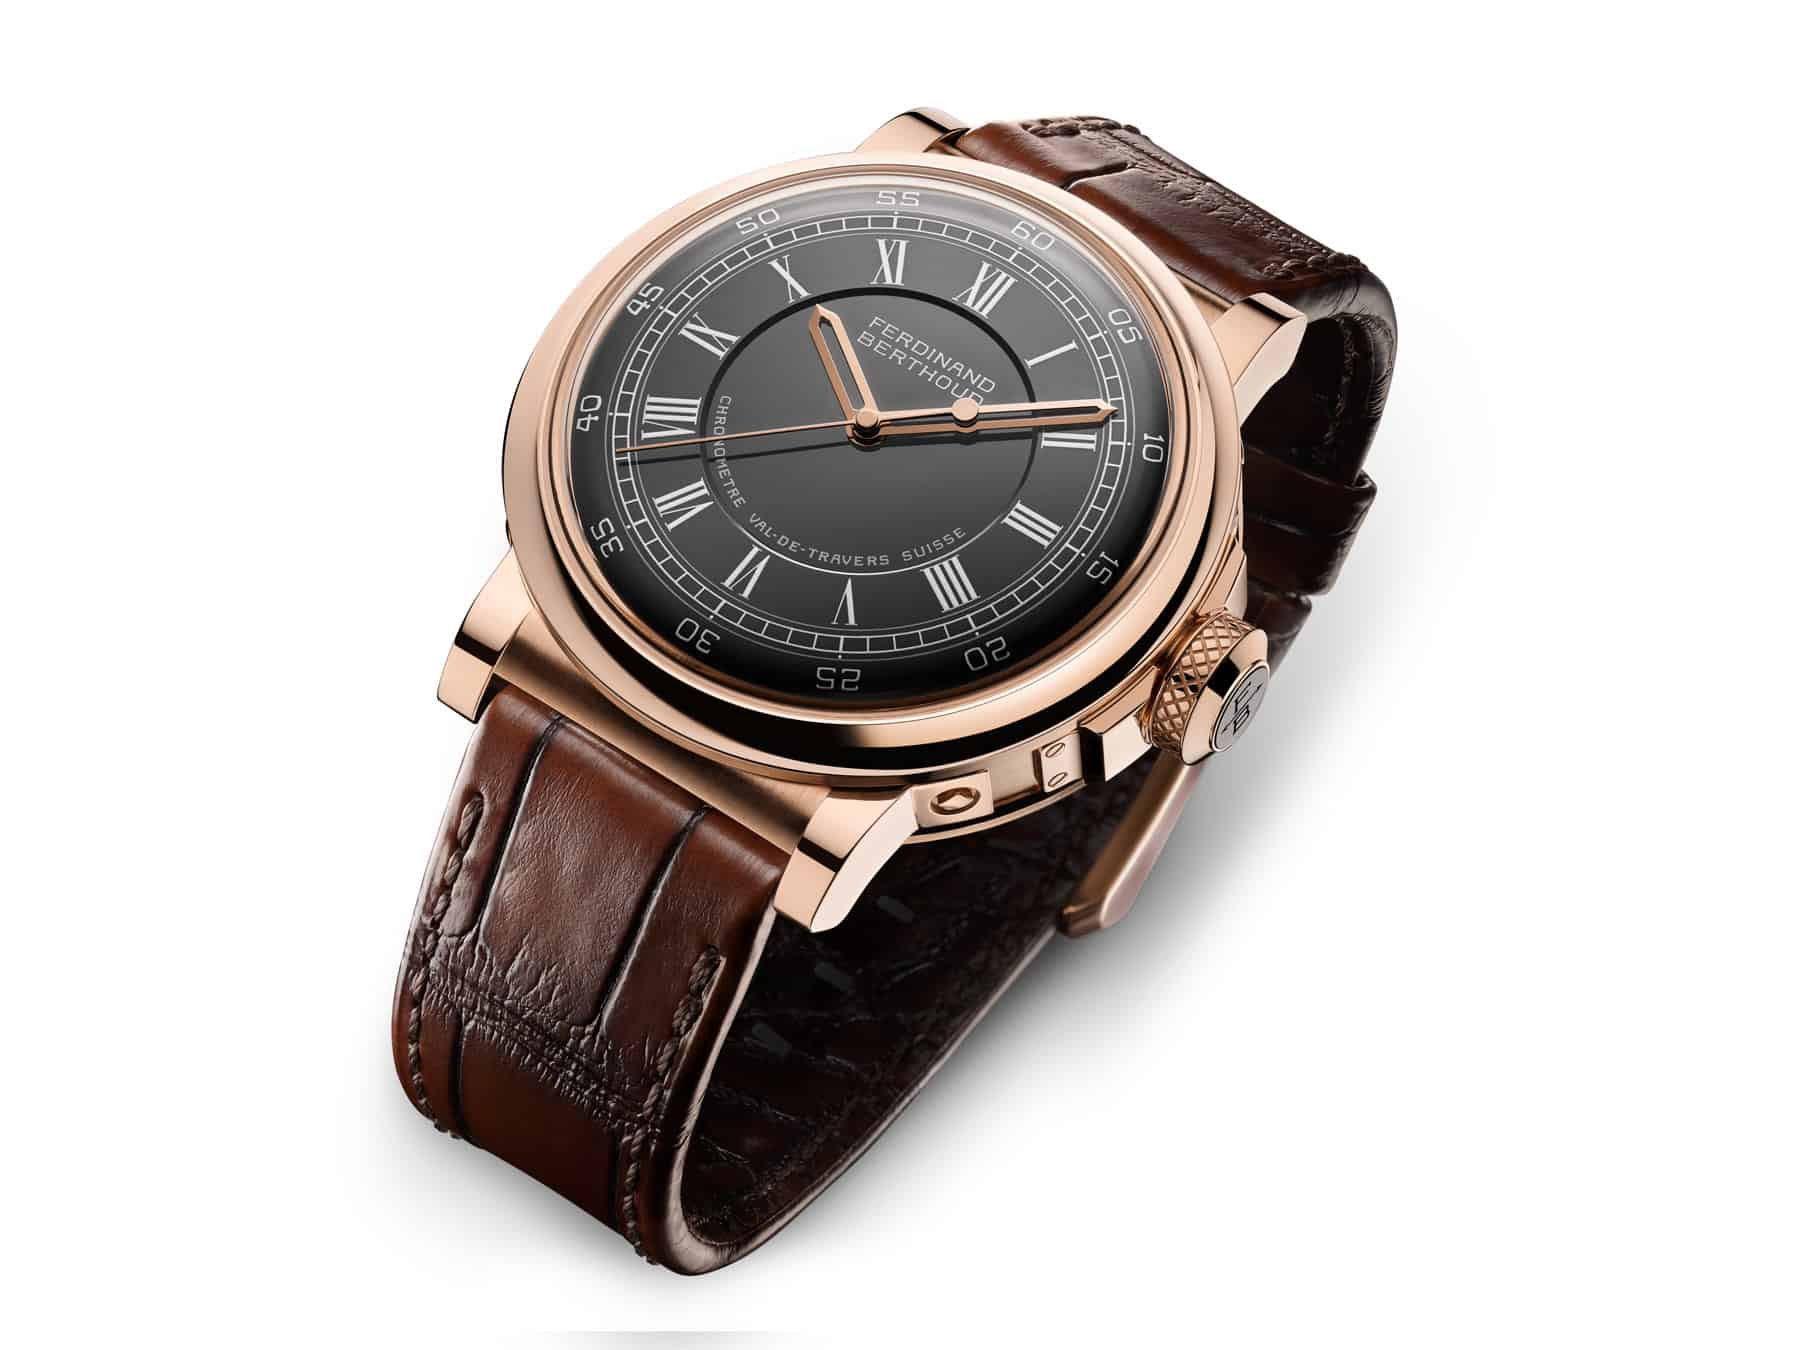 Chronometrie-Ferdinand Berthoud-Chronometer-FB2